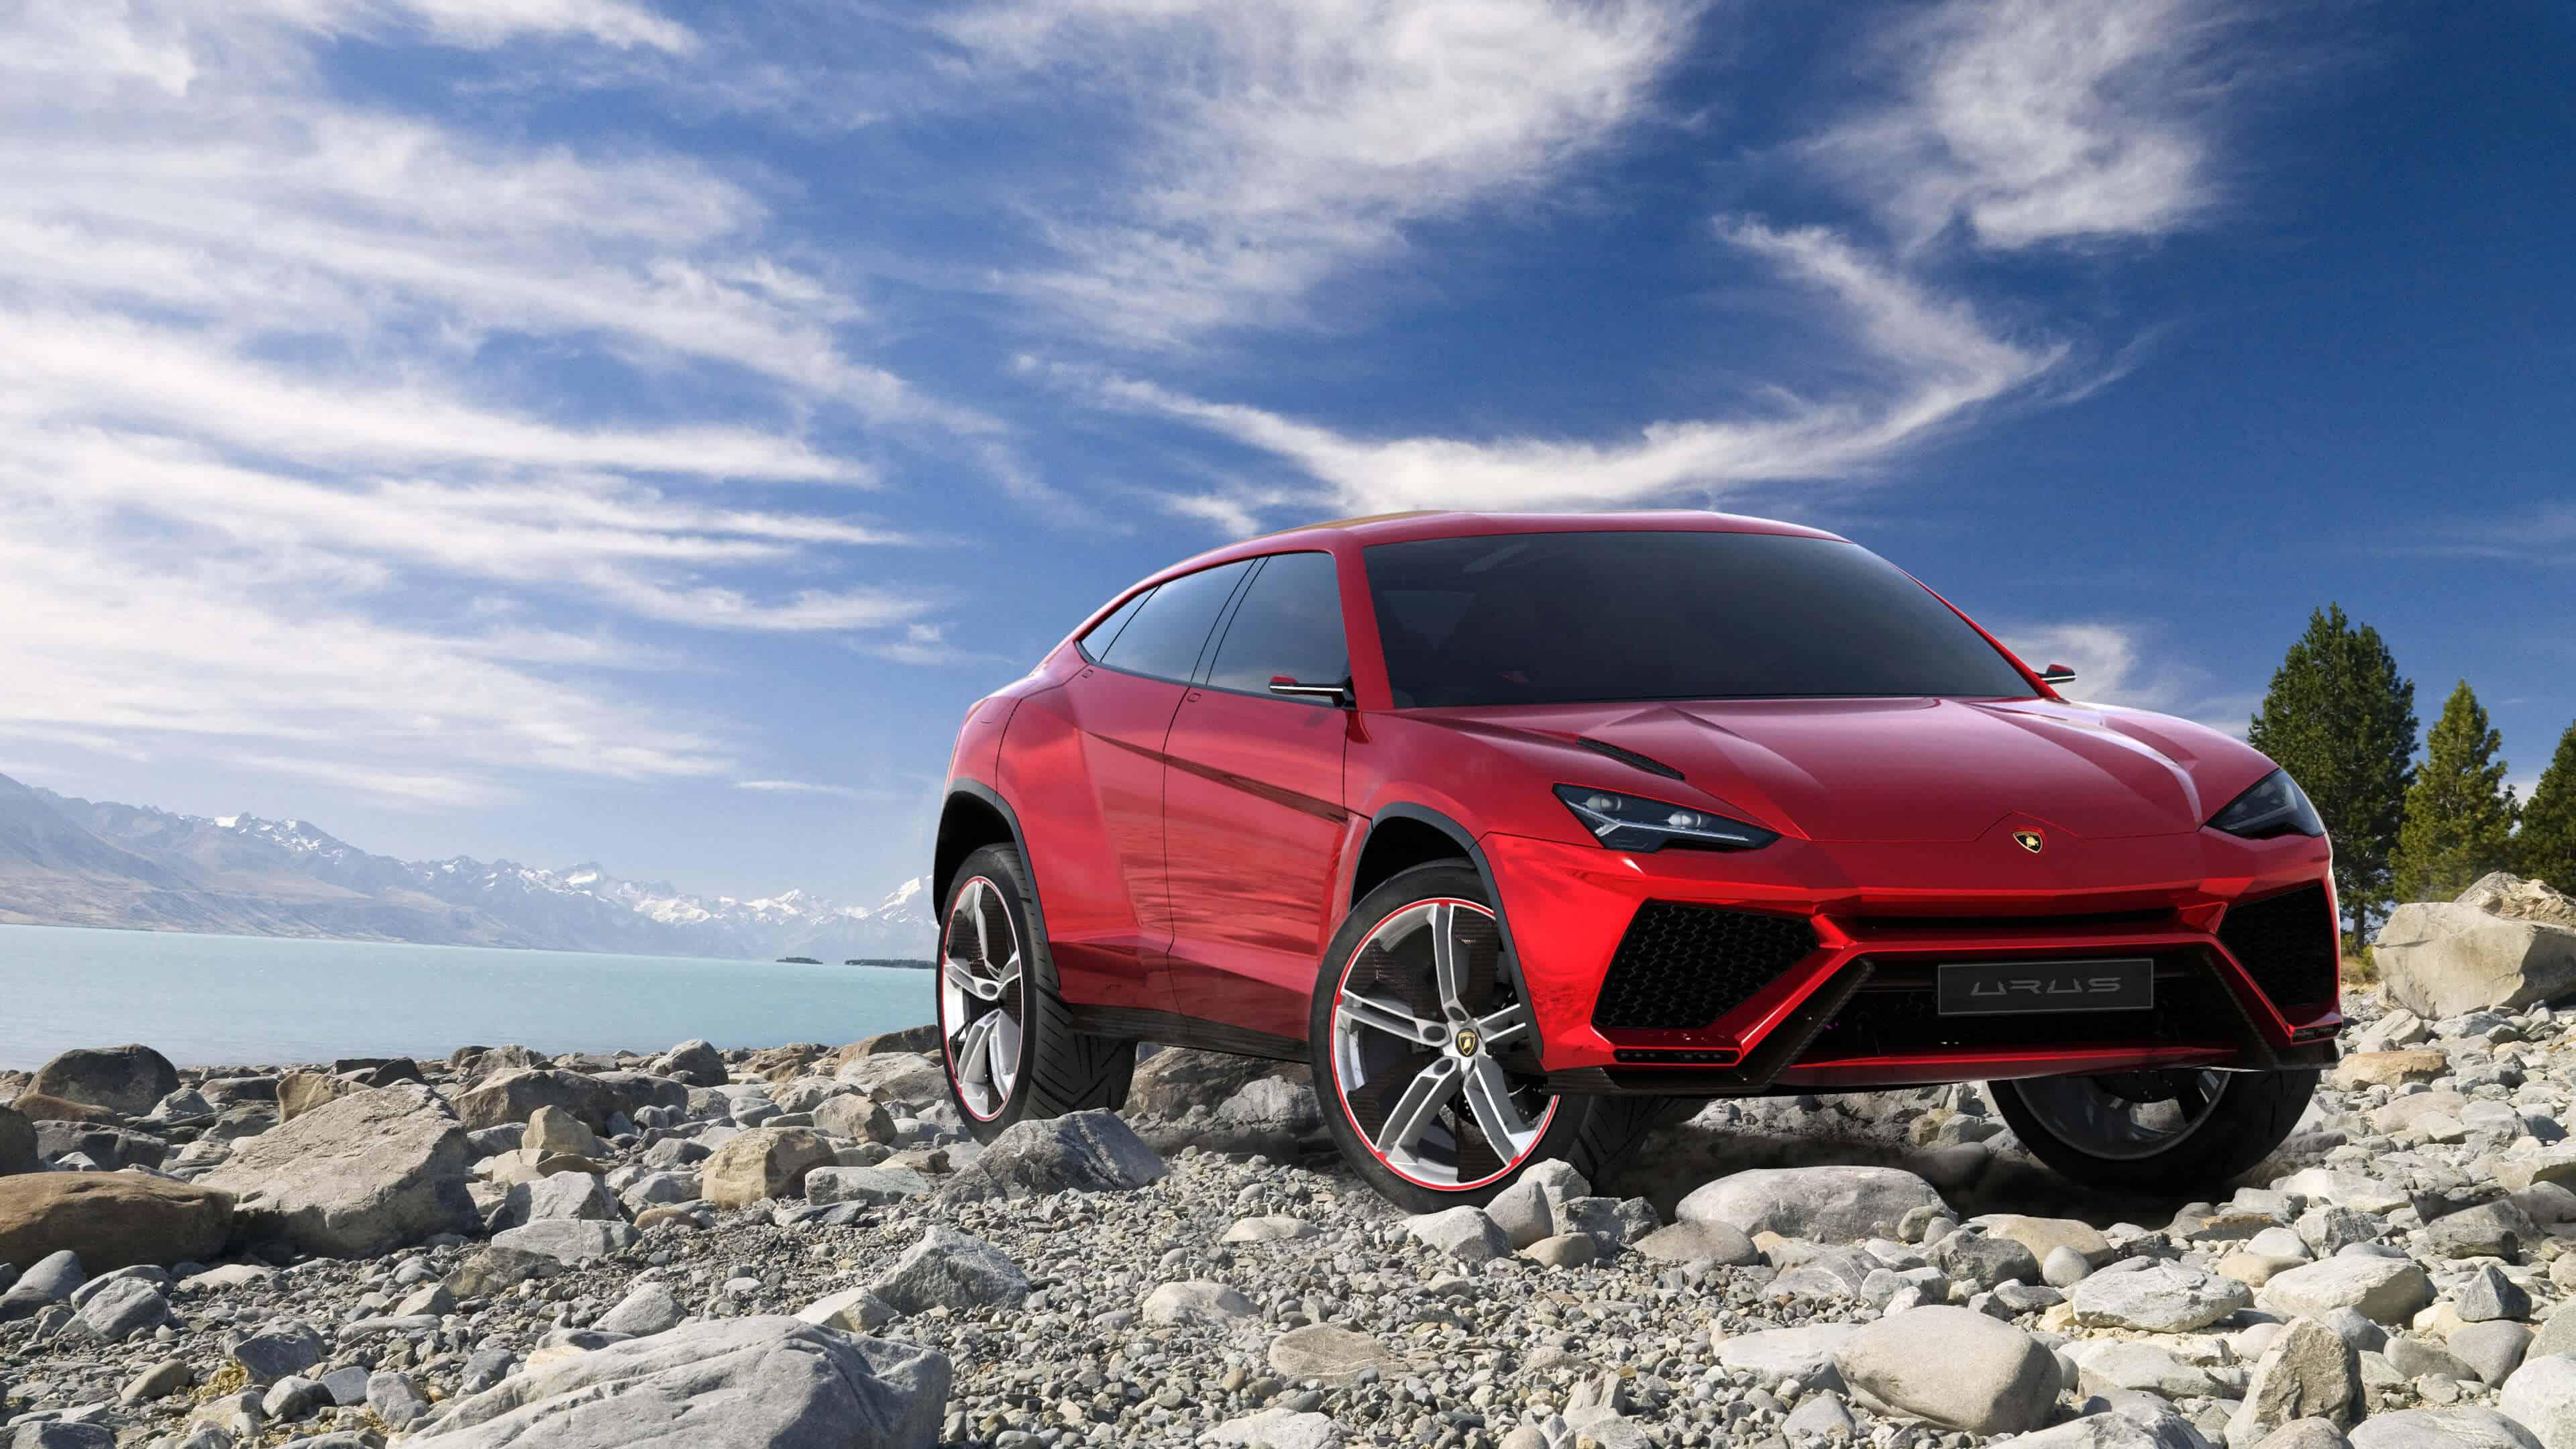 Lamborghini Urus Suv Red Uhd 4k Wallpaper Pixelz